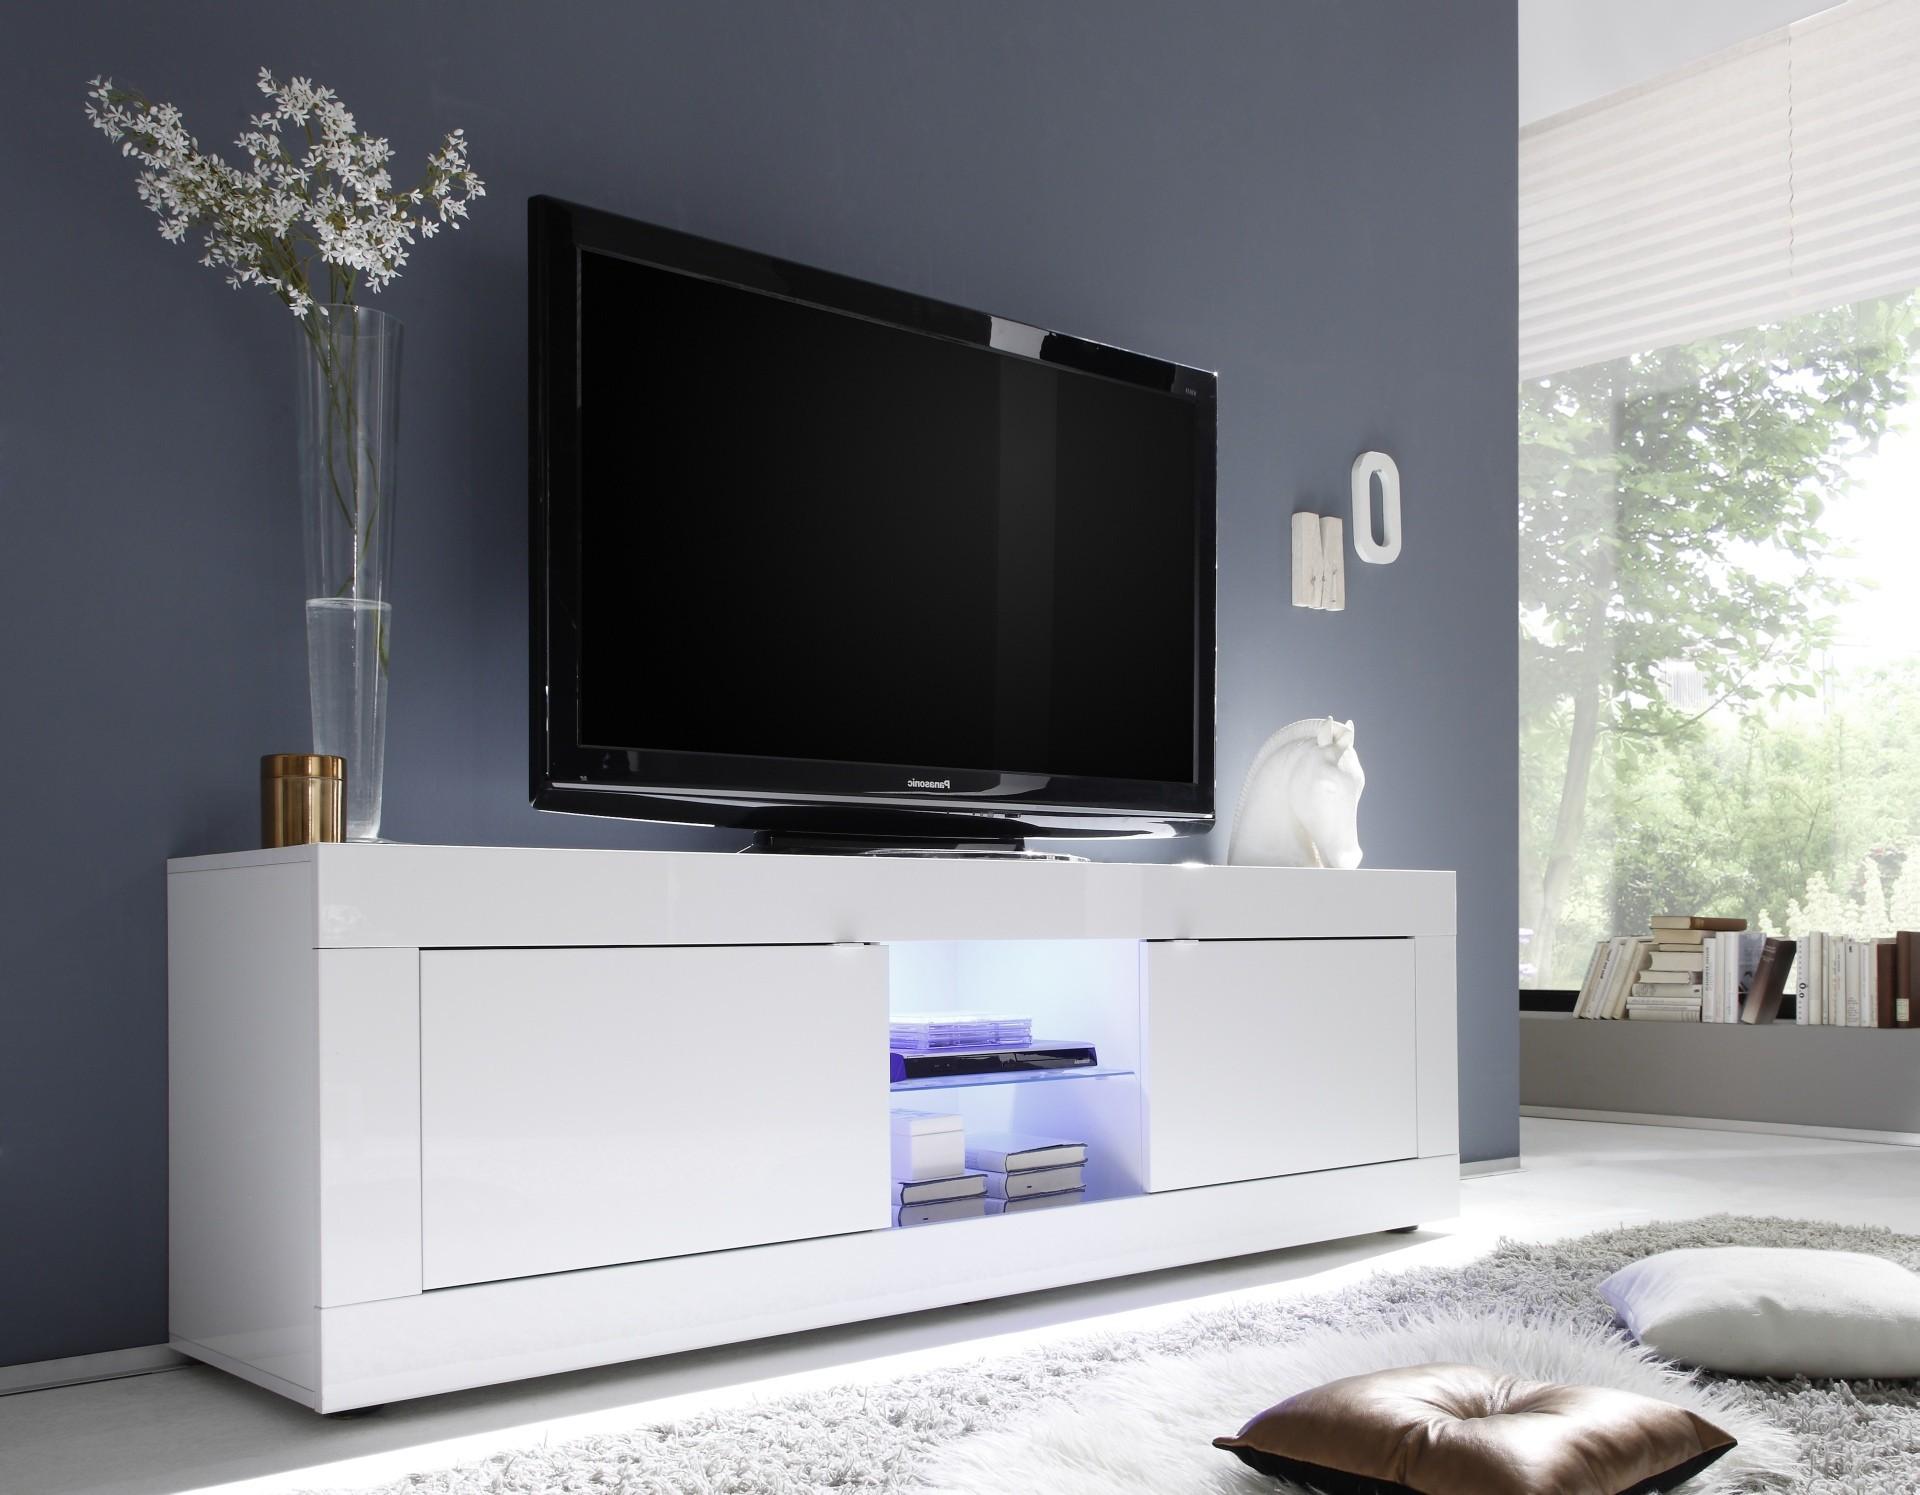 Meuble Tv Toronto Blanc 2 Portes 1 Niche Fabriqu En Italie # Meuble Tv Blanc Long